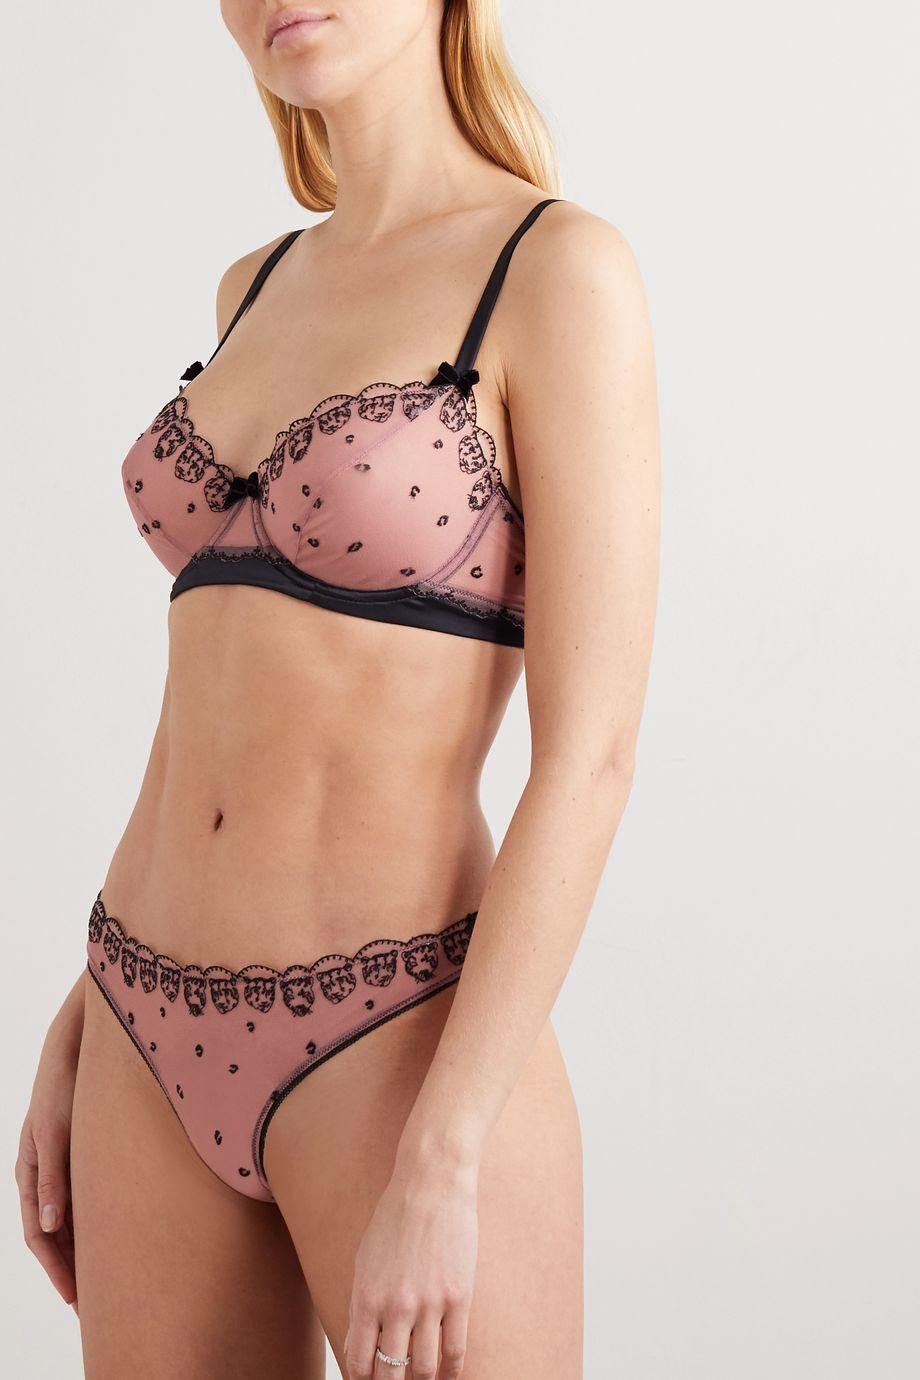 Morgan Lane + Atlanta de Cadenet Taylor Matilda embroidered tulle underwired soft-cup bra